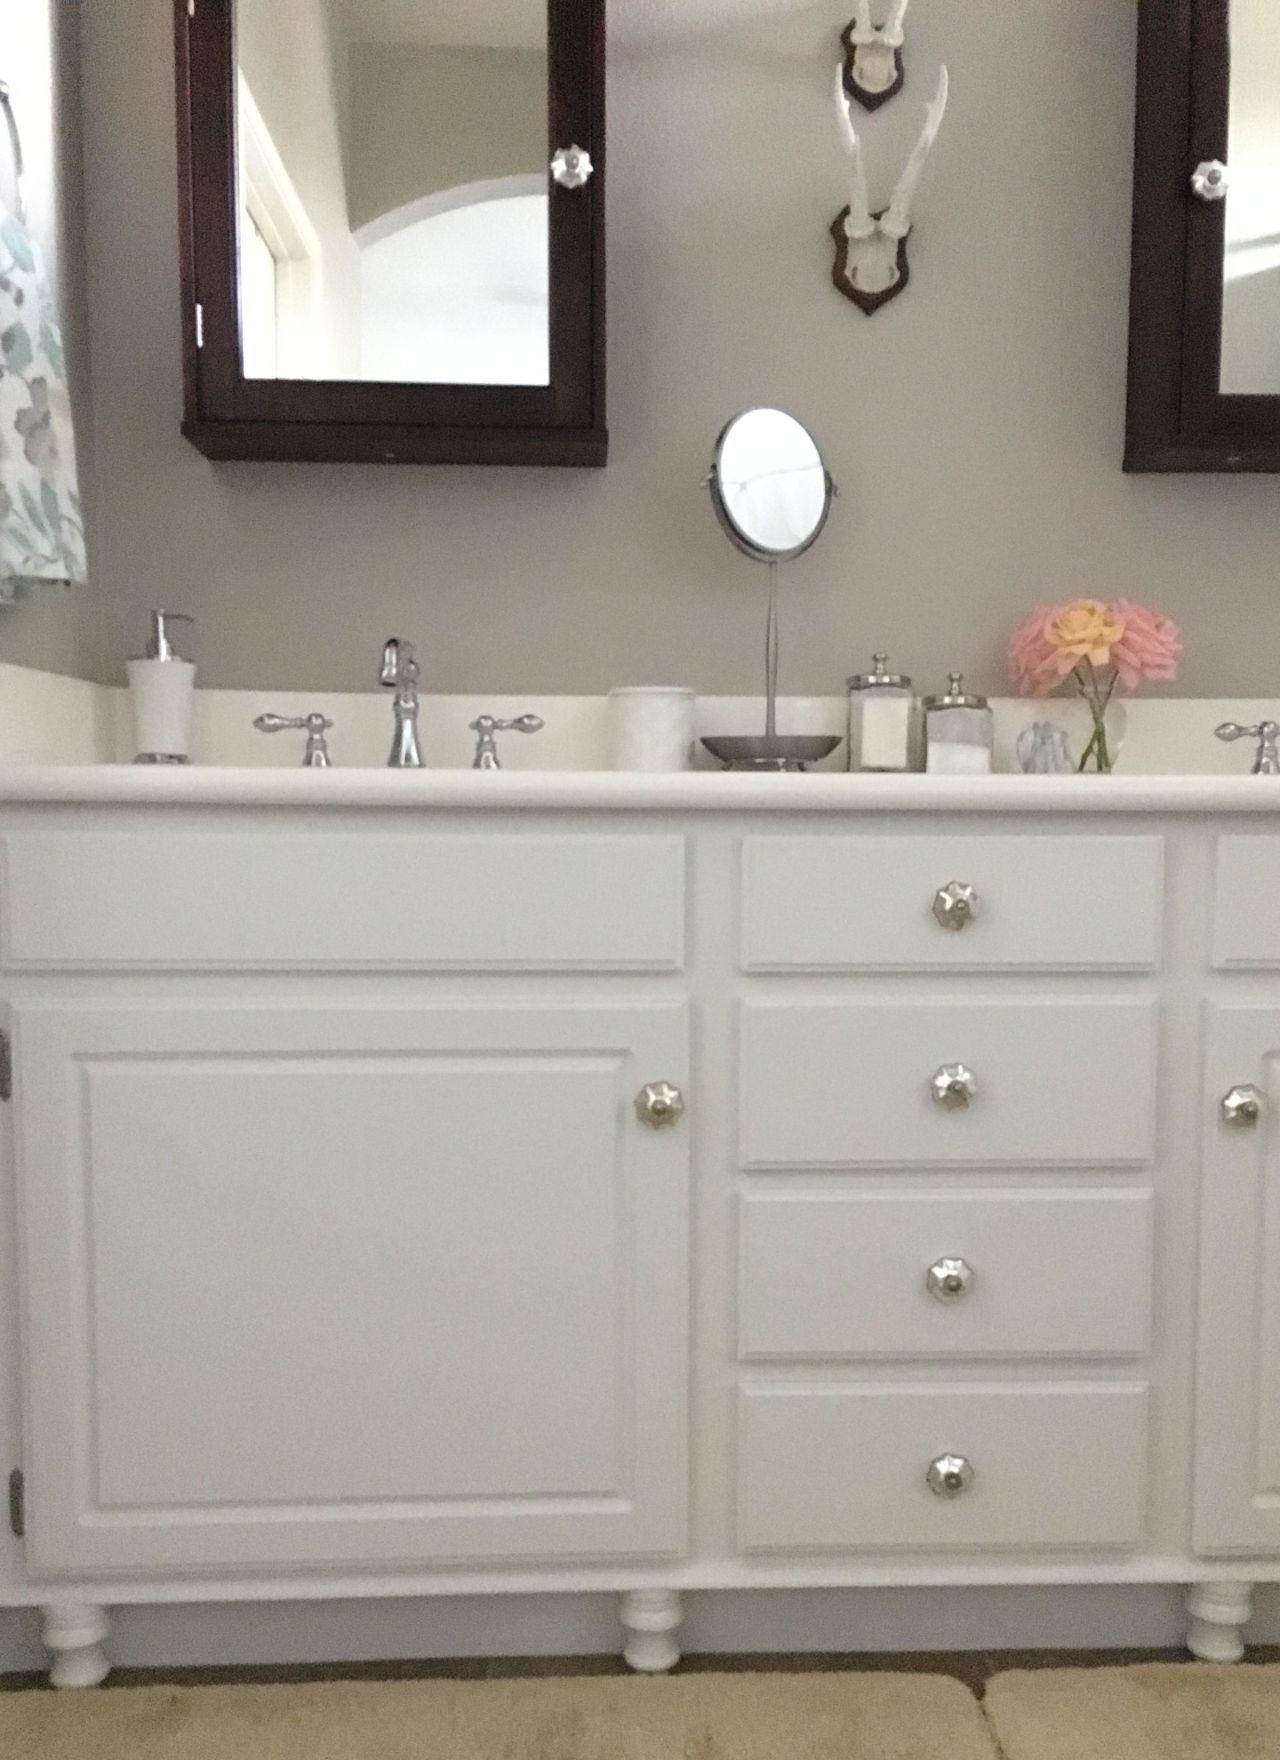 Adding Wood Feet to a Bathroom Vanity